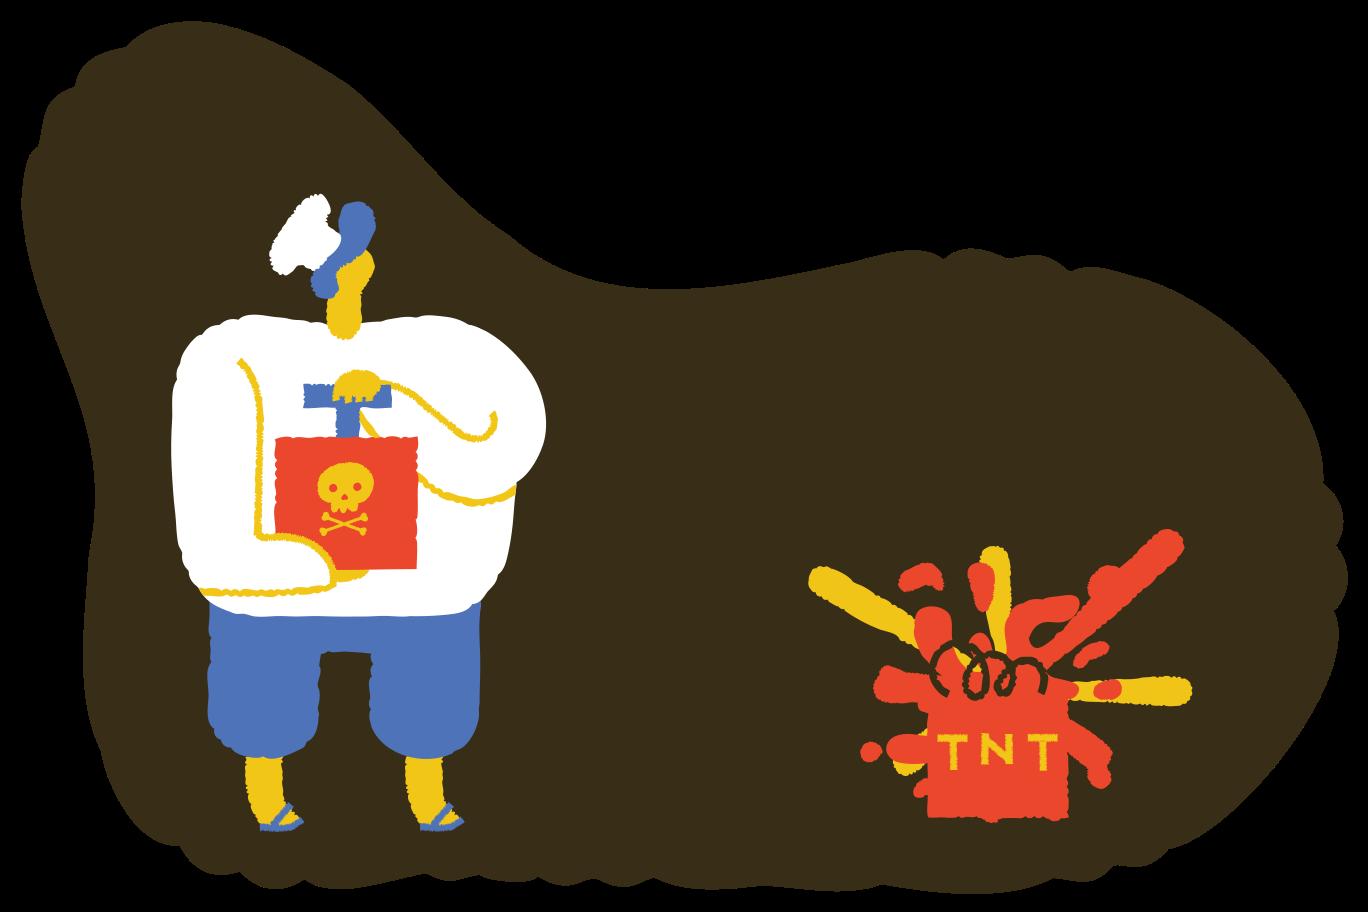 Explosion Clipart illustration in PNG, SVG